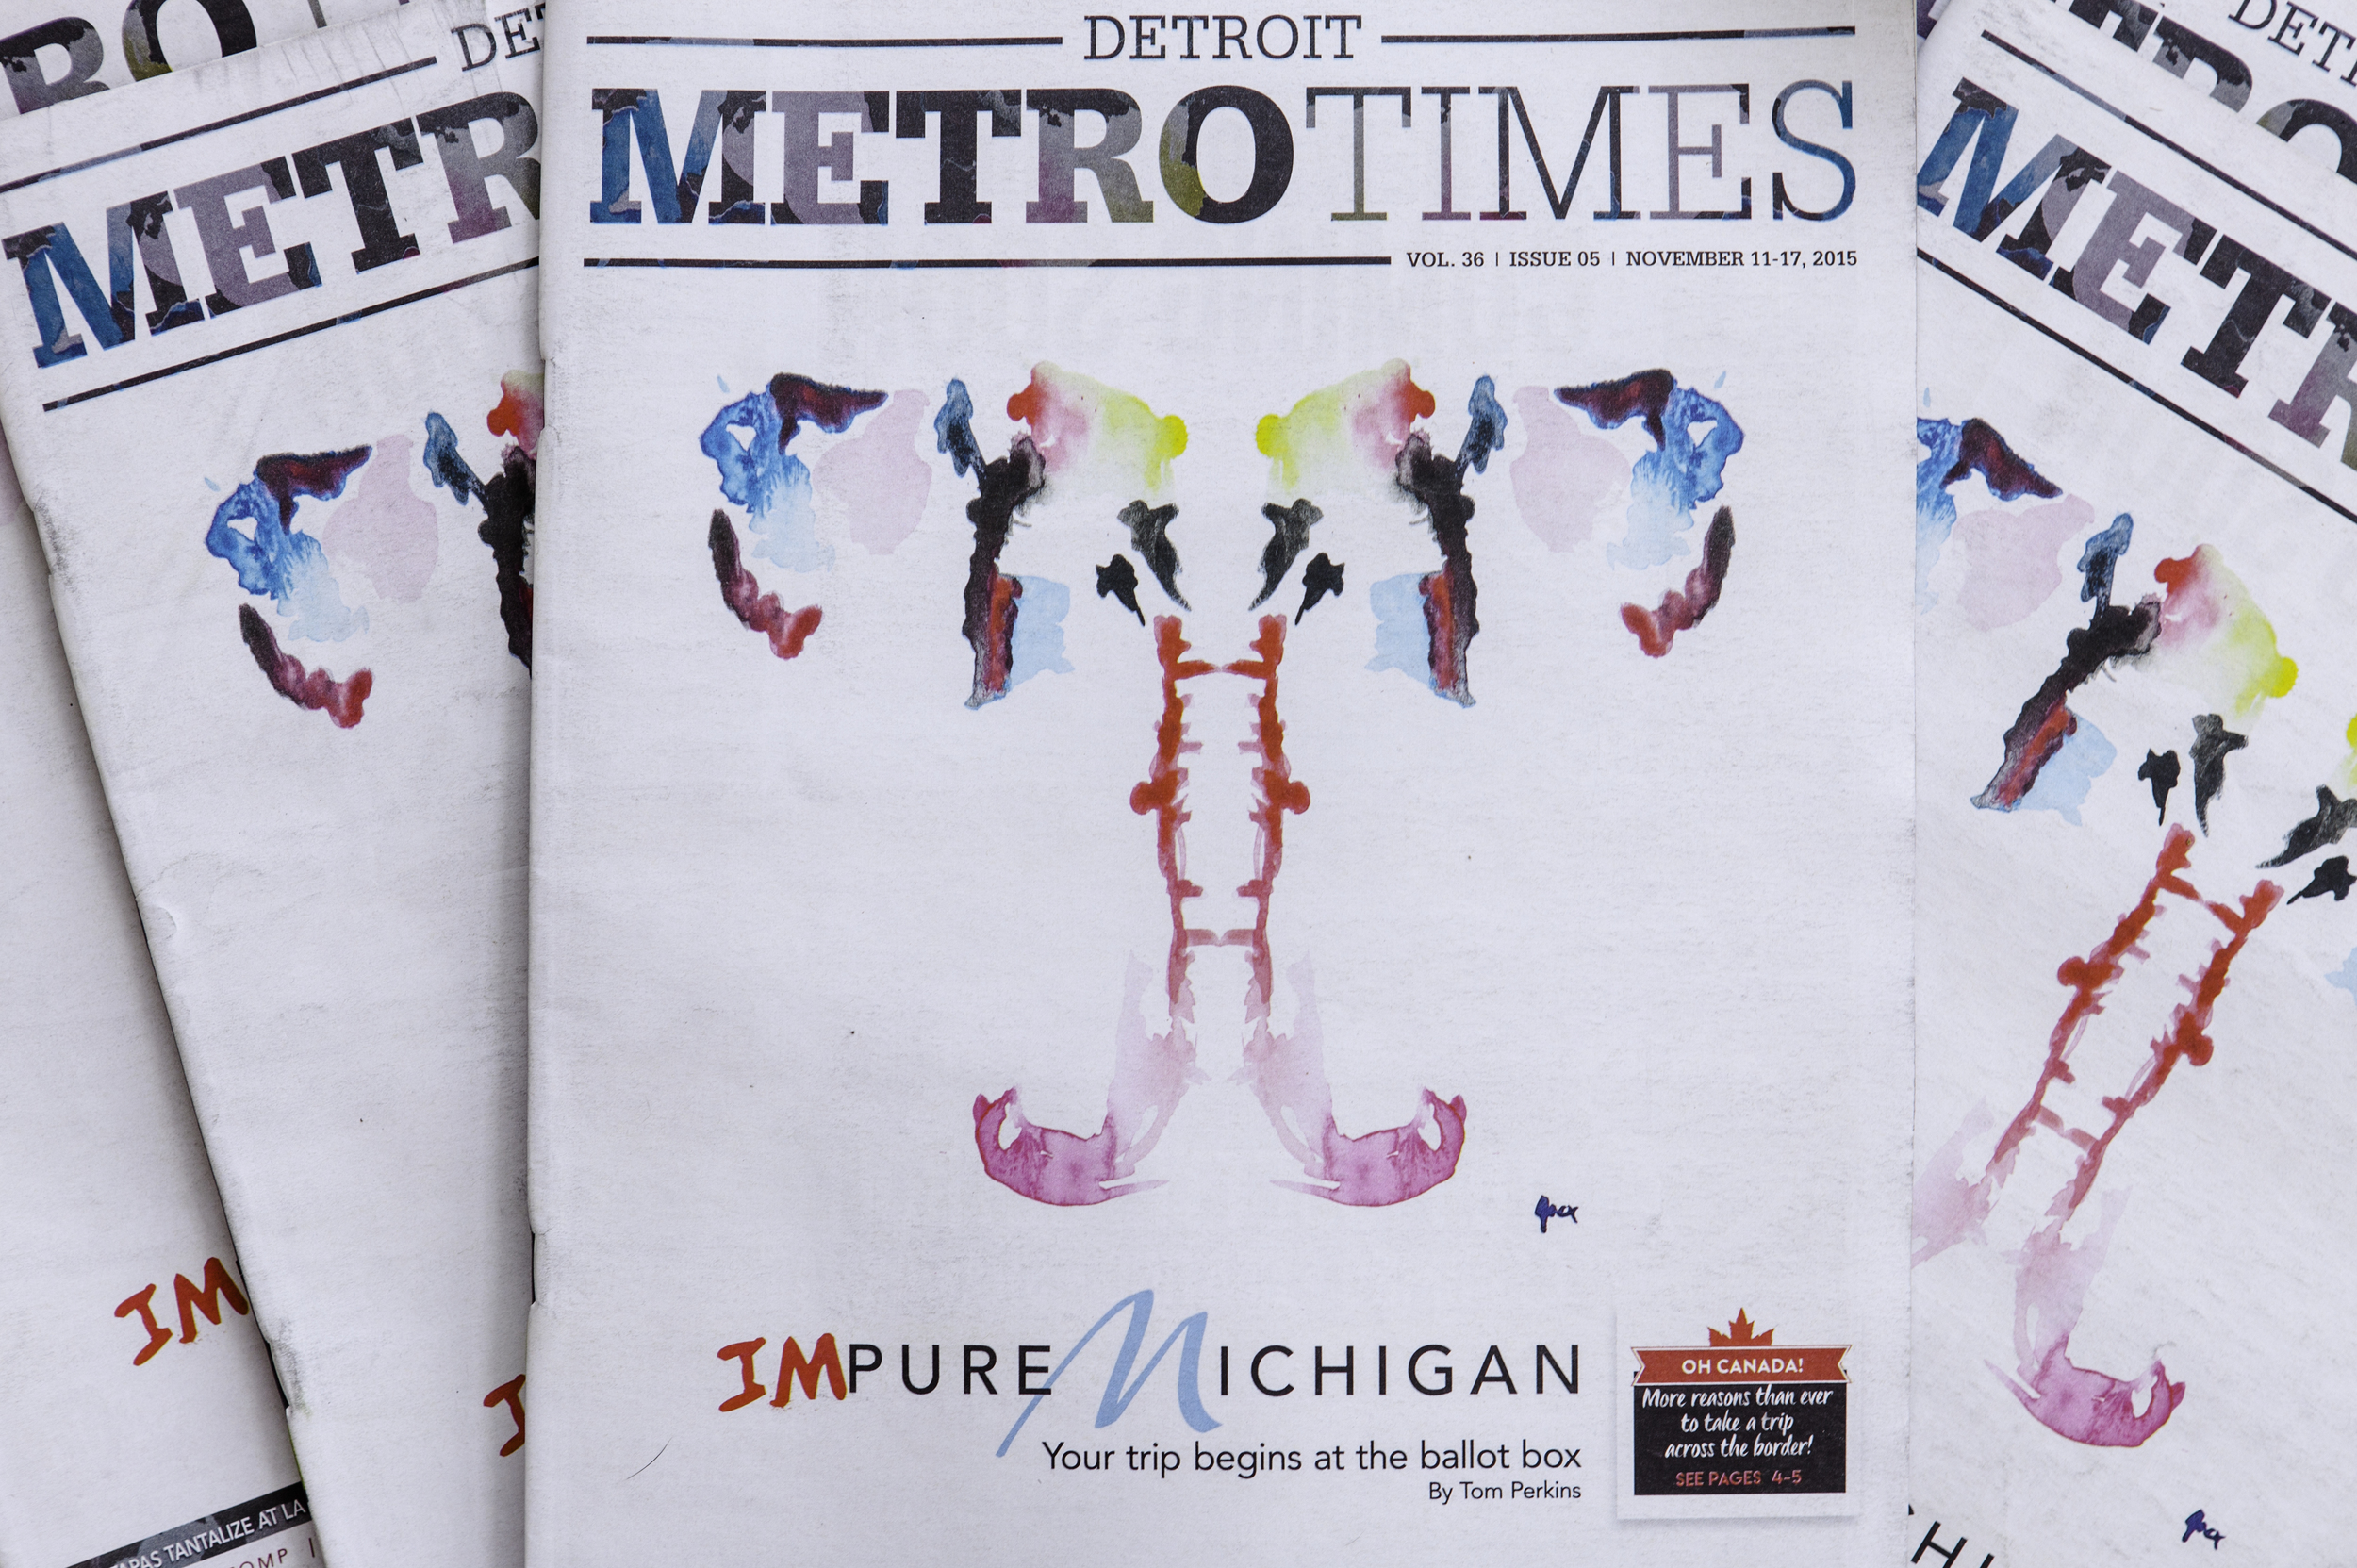 MetroTimesCover1(HIGHRES).jpg